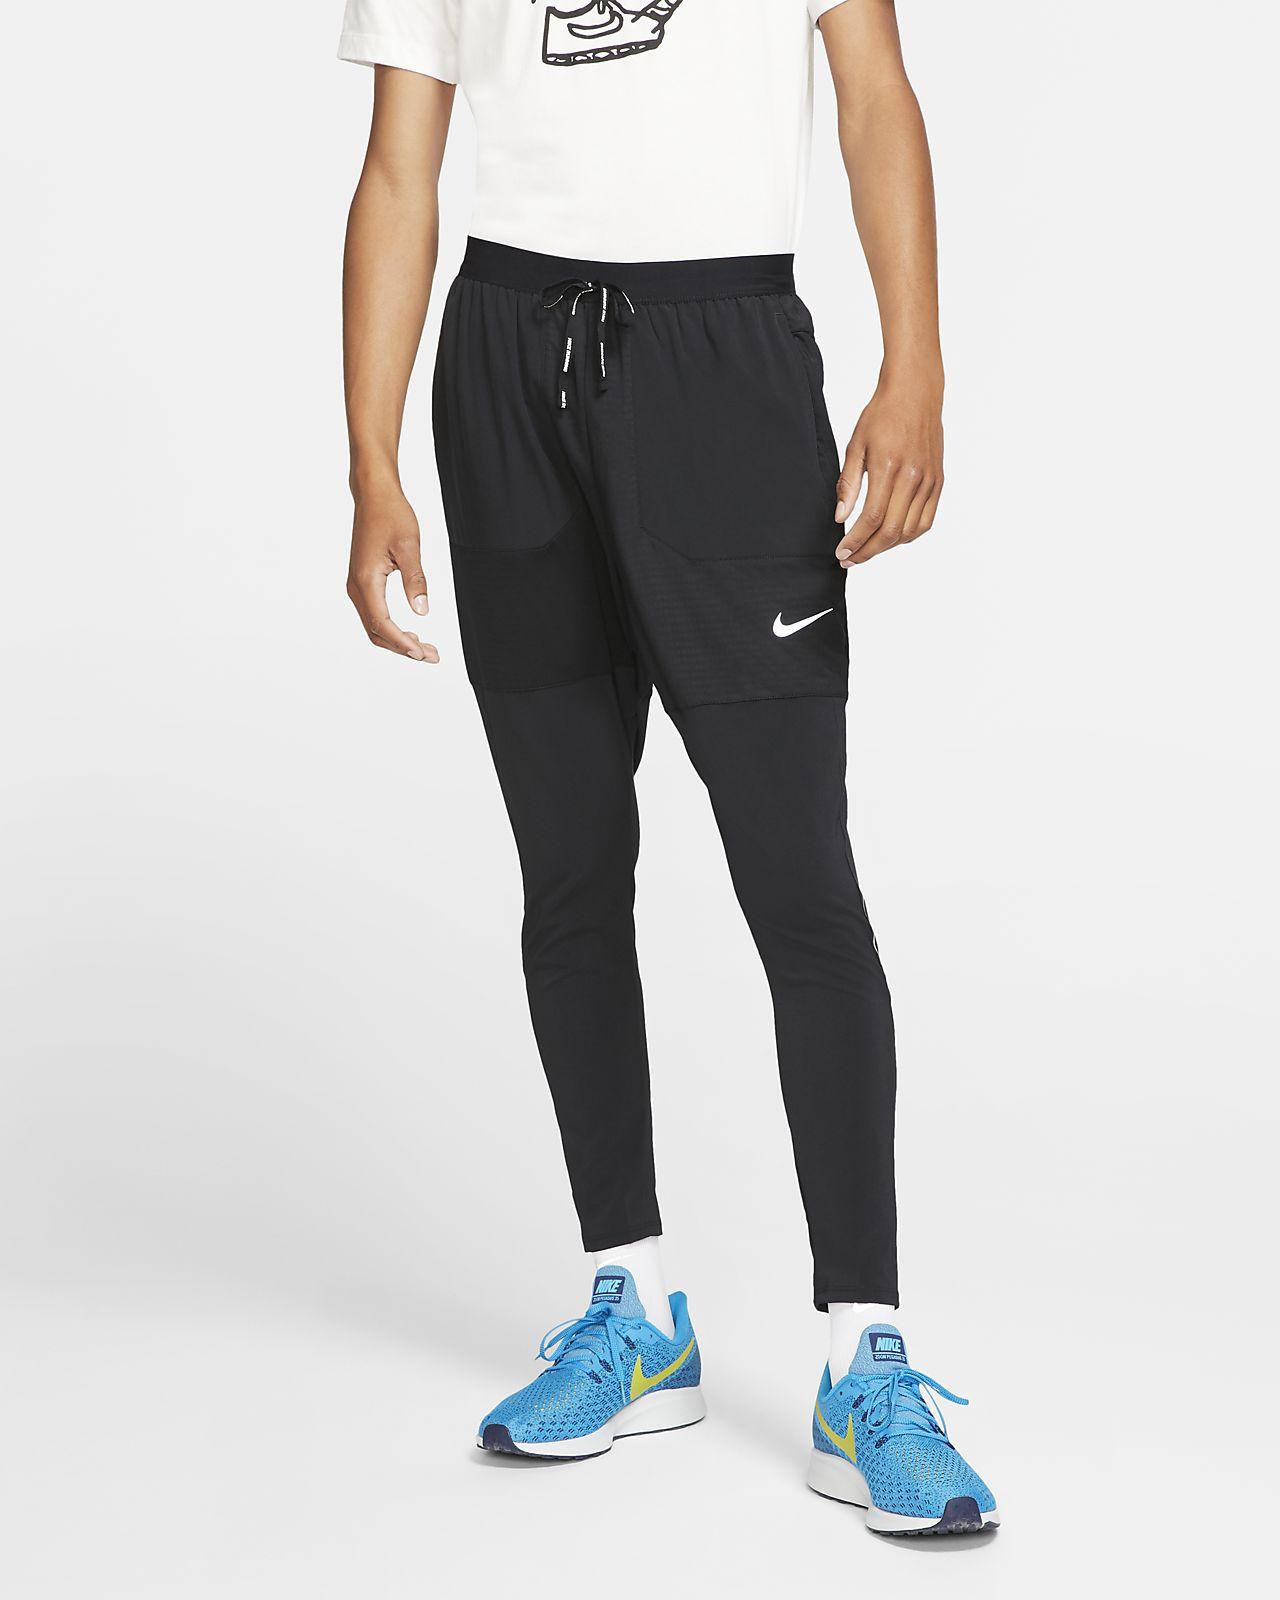 Pantaloni da running Nike Phenom - Uomo